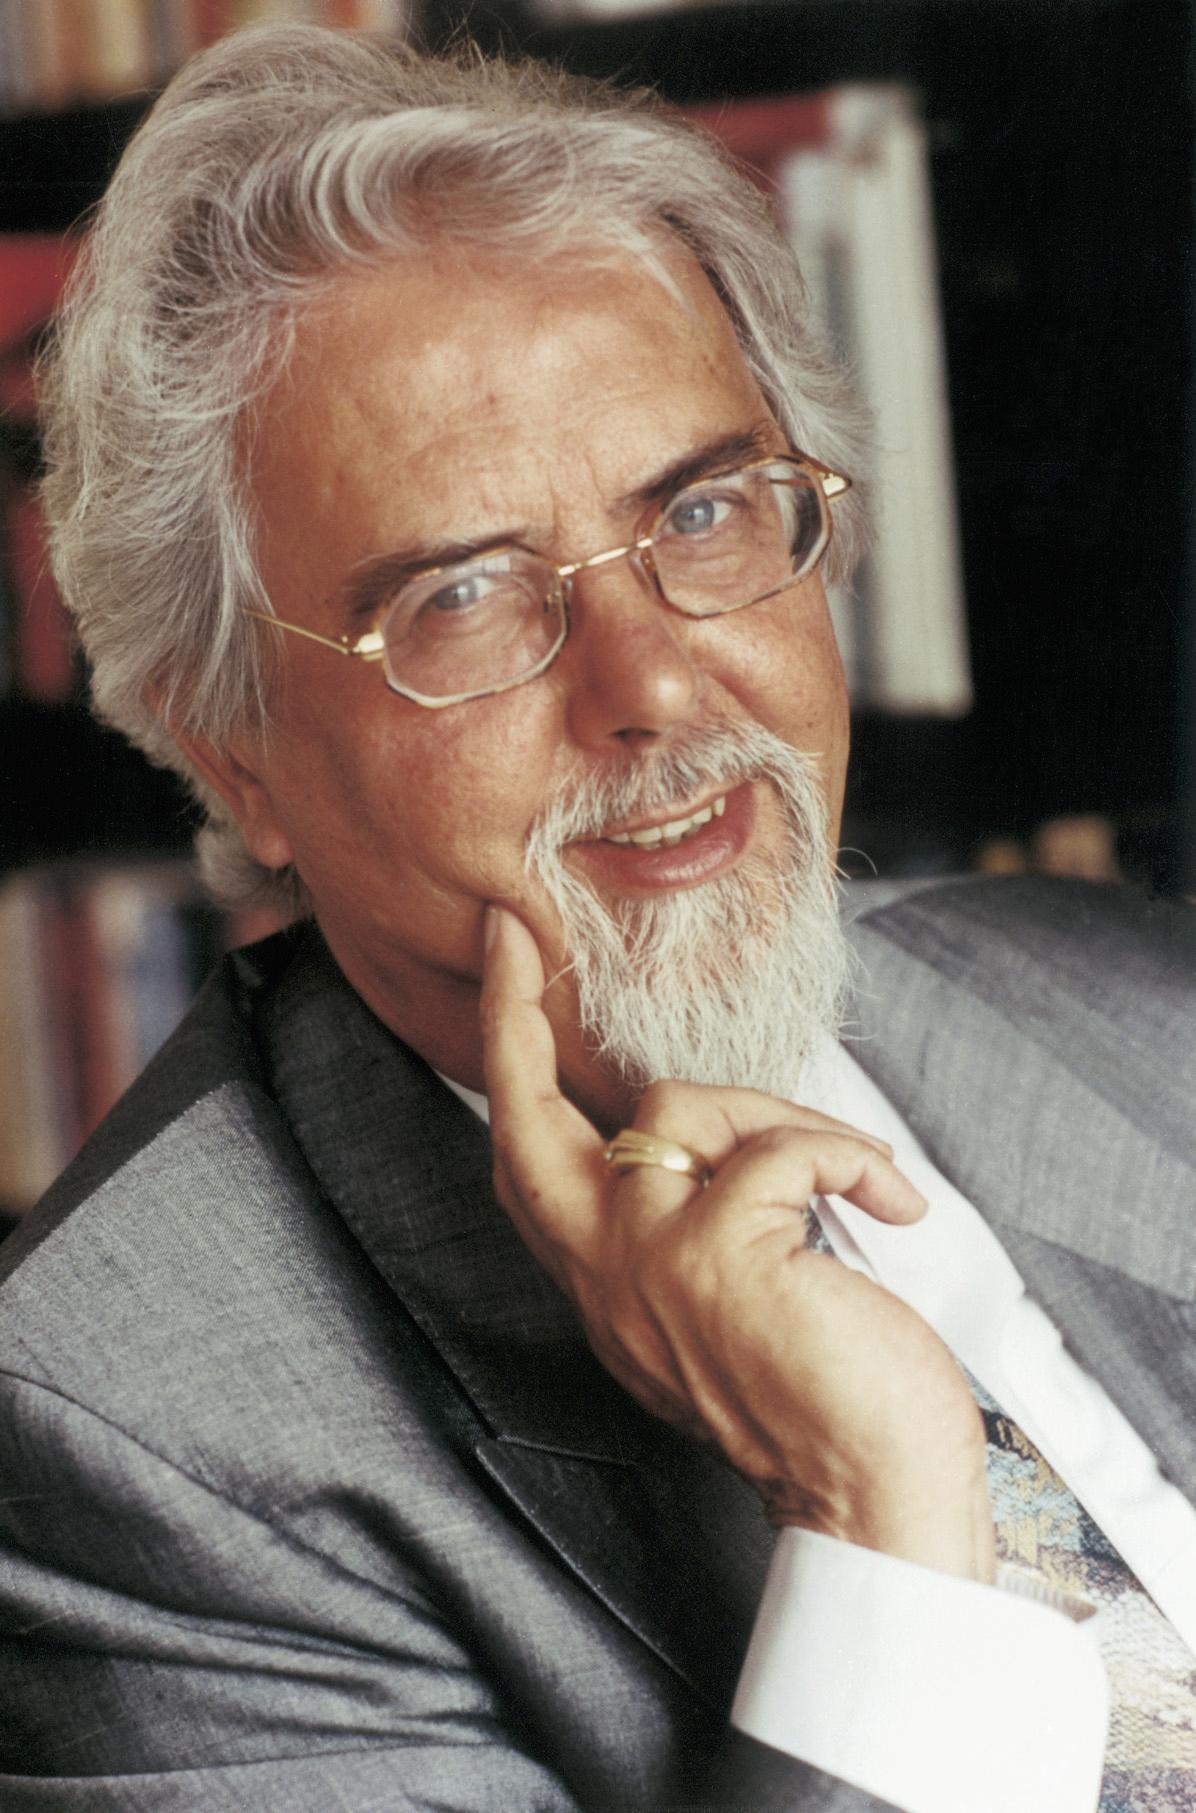 Hugo De Ridder